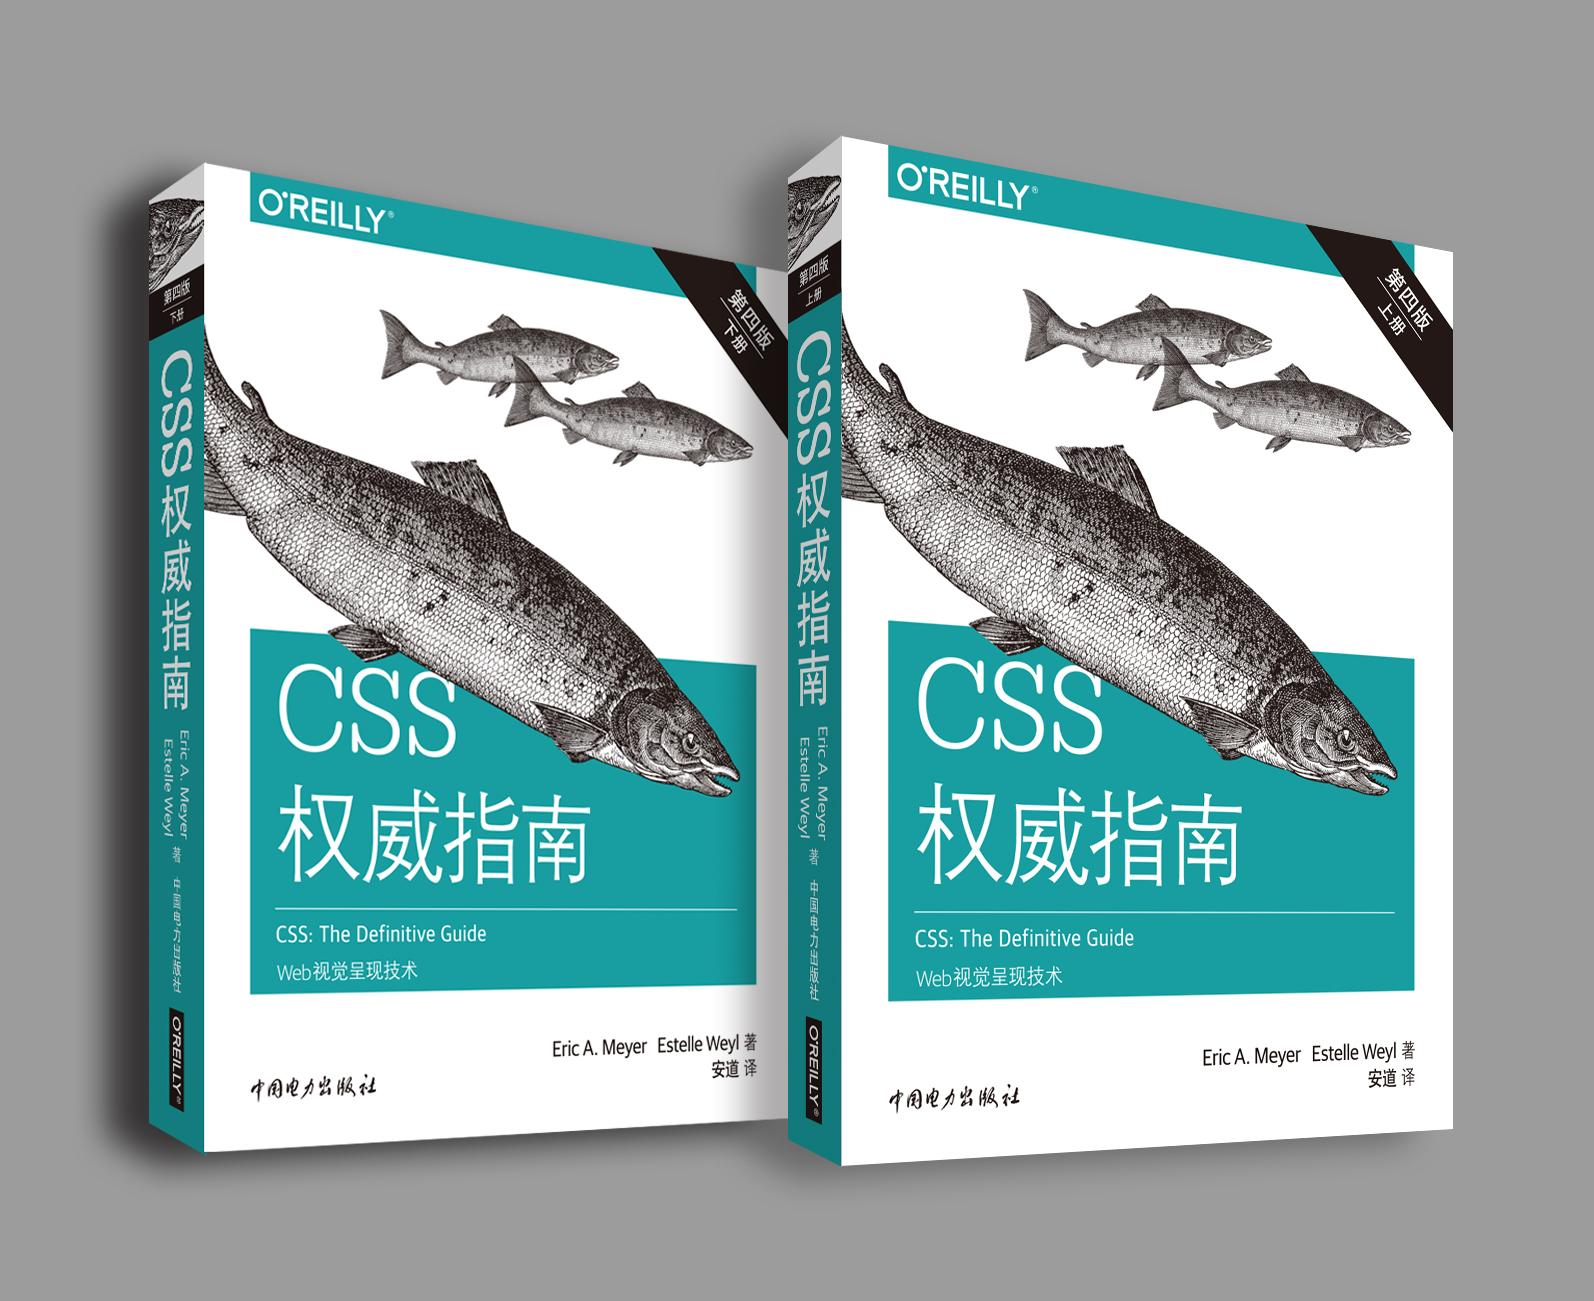 CSS 权威指南(第四版)